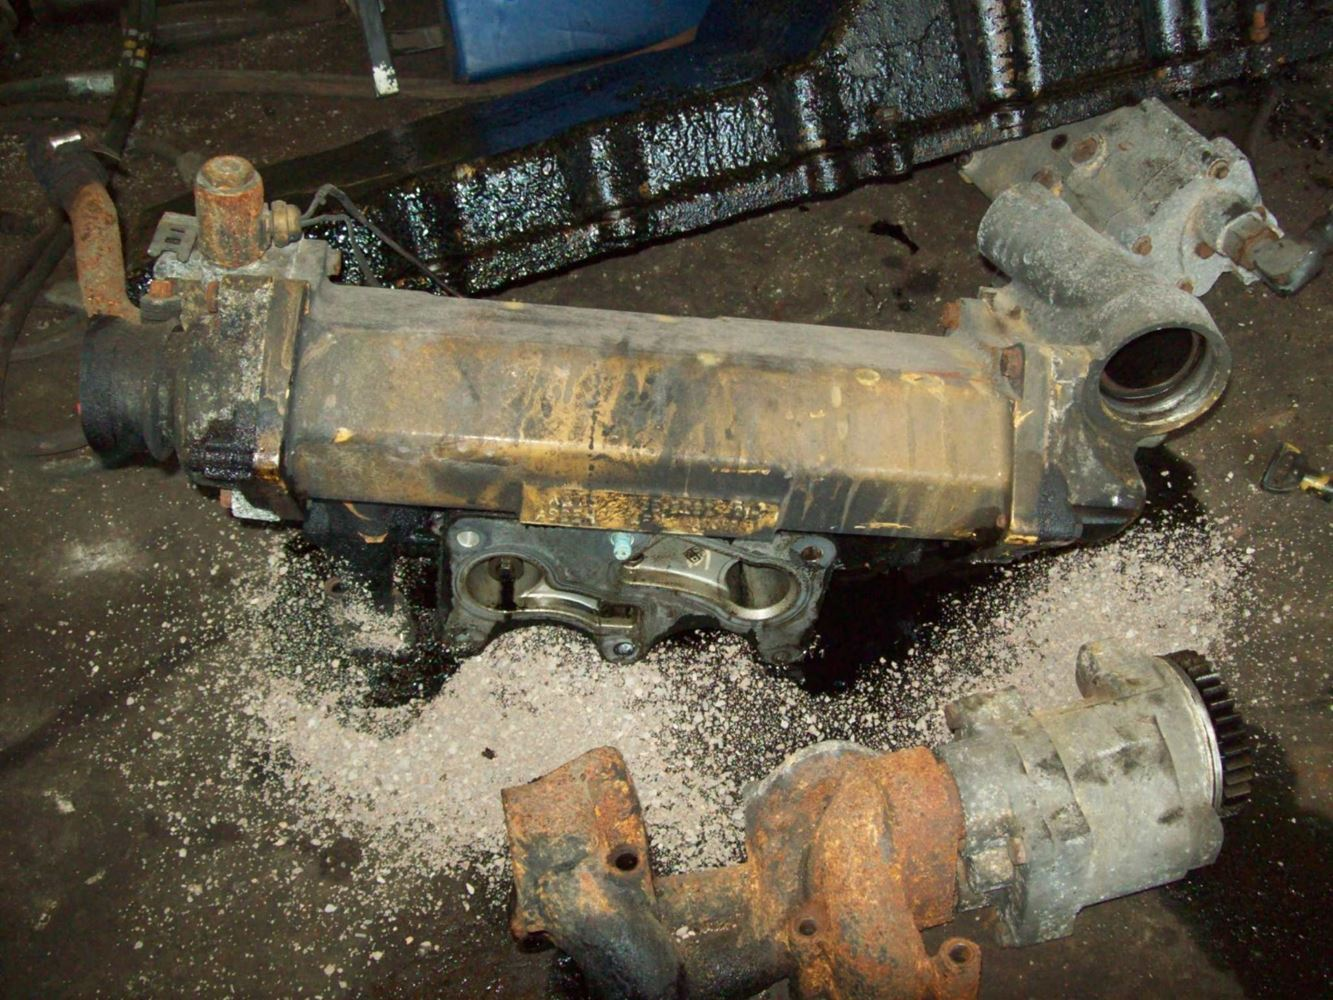 Ontario Truck Parts >> 2006 Caterpillar C13 (Stock #21113188) | Oil Coolers | TPI